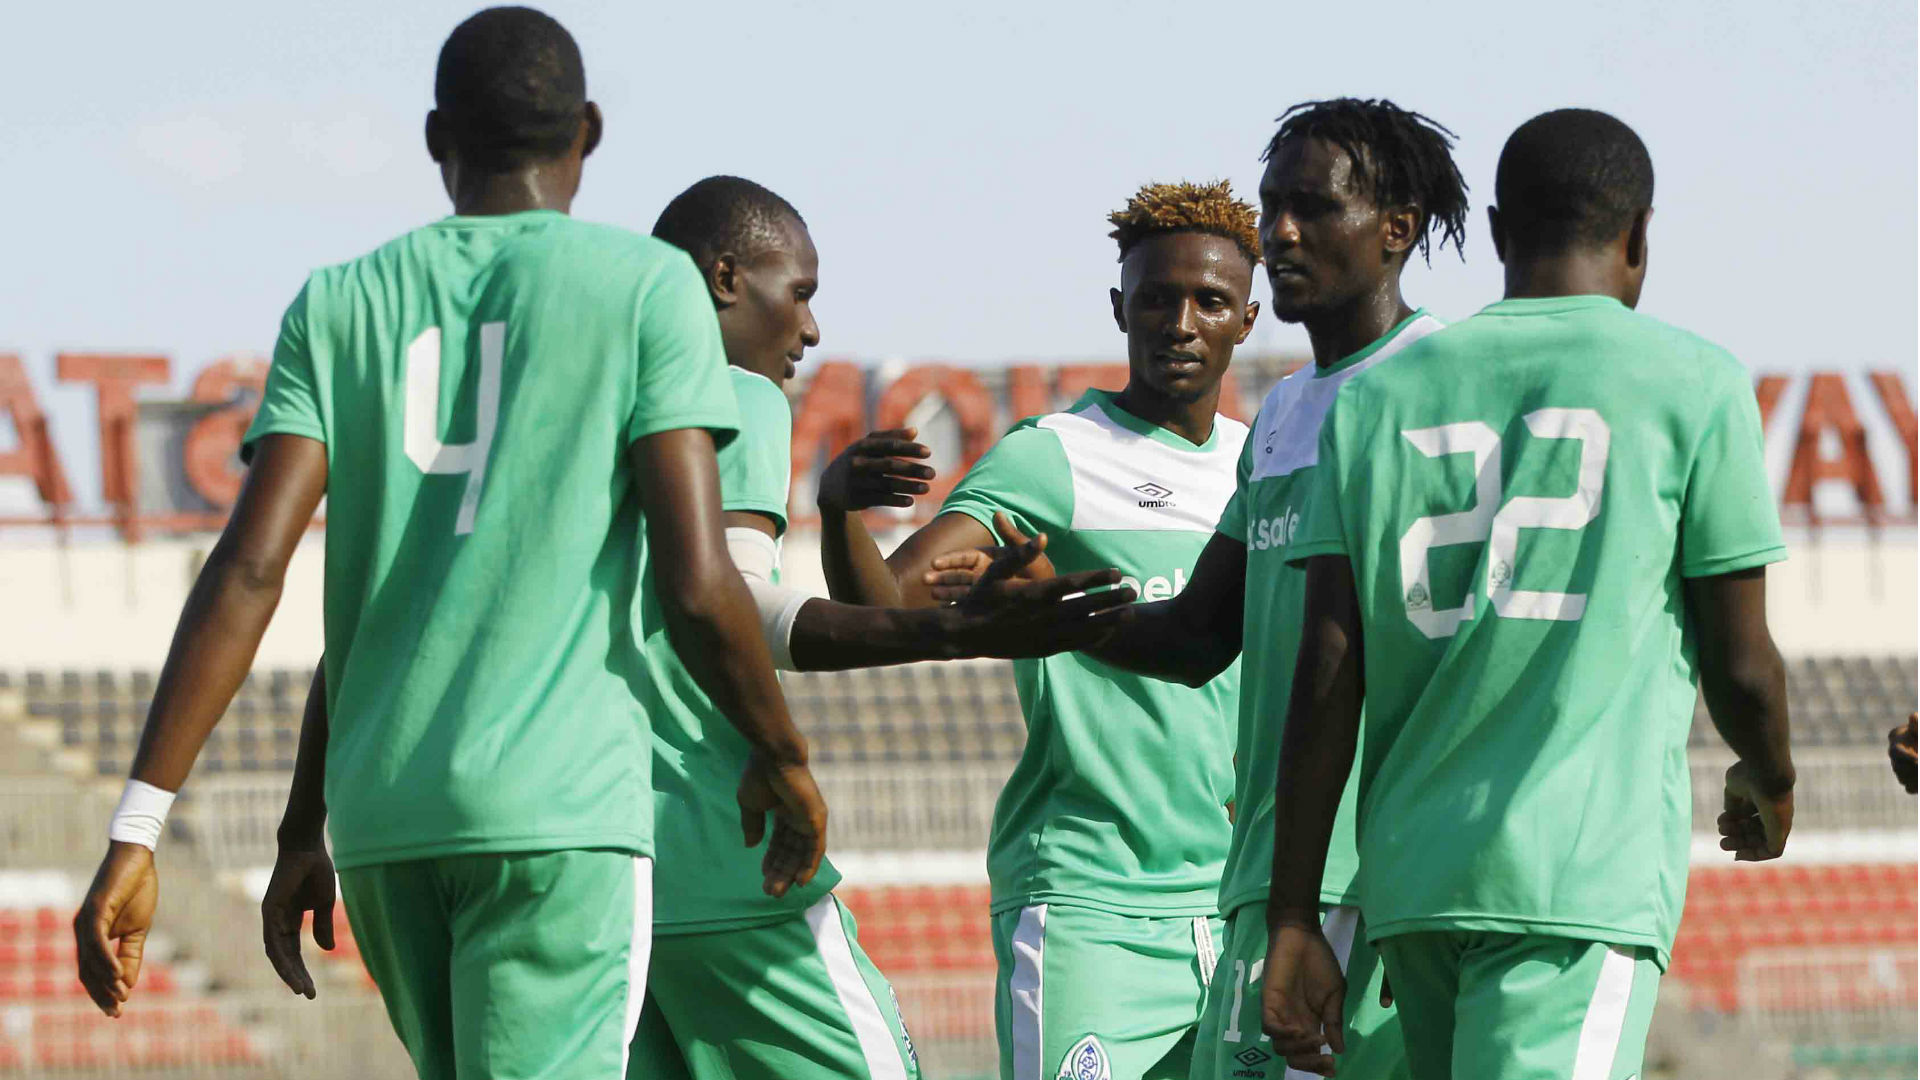 Caf Champions League: Muguna and Gor Mahia players who can restore their pride against CR Belouizdad